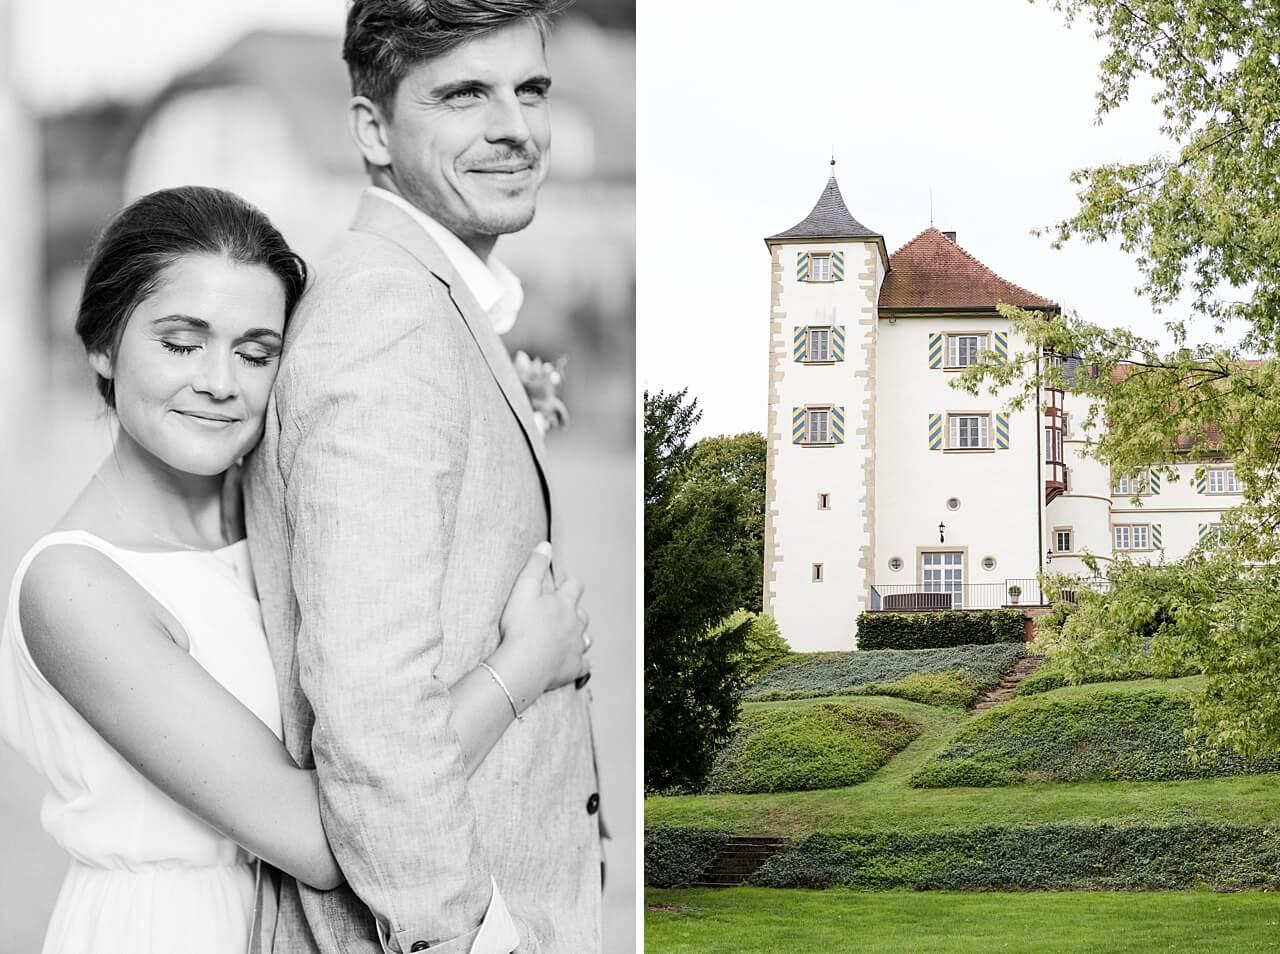 Rebecca Conte Fotografie: Hochzeit Schloss Neuhaus 08